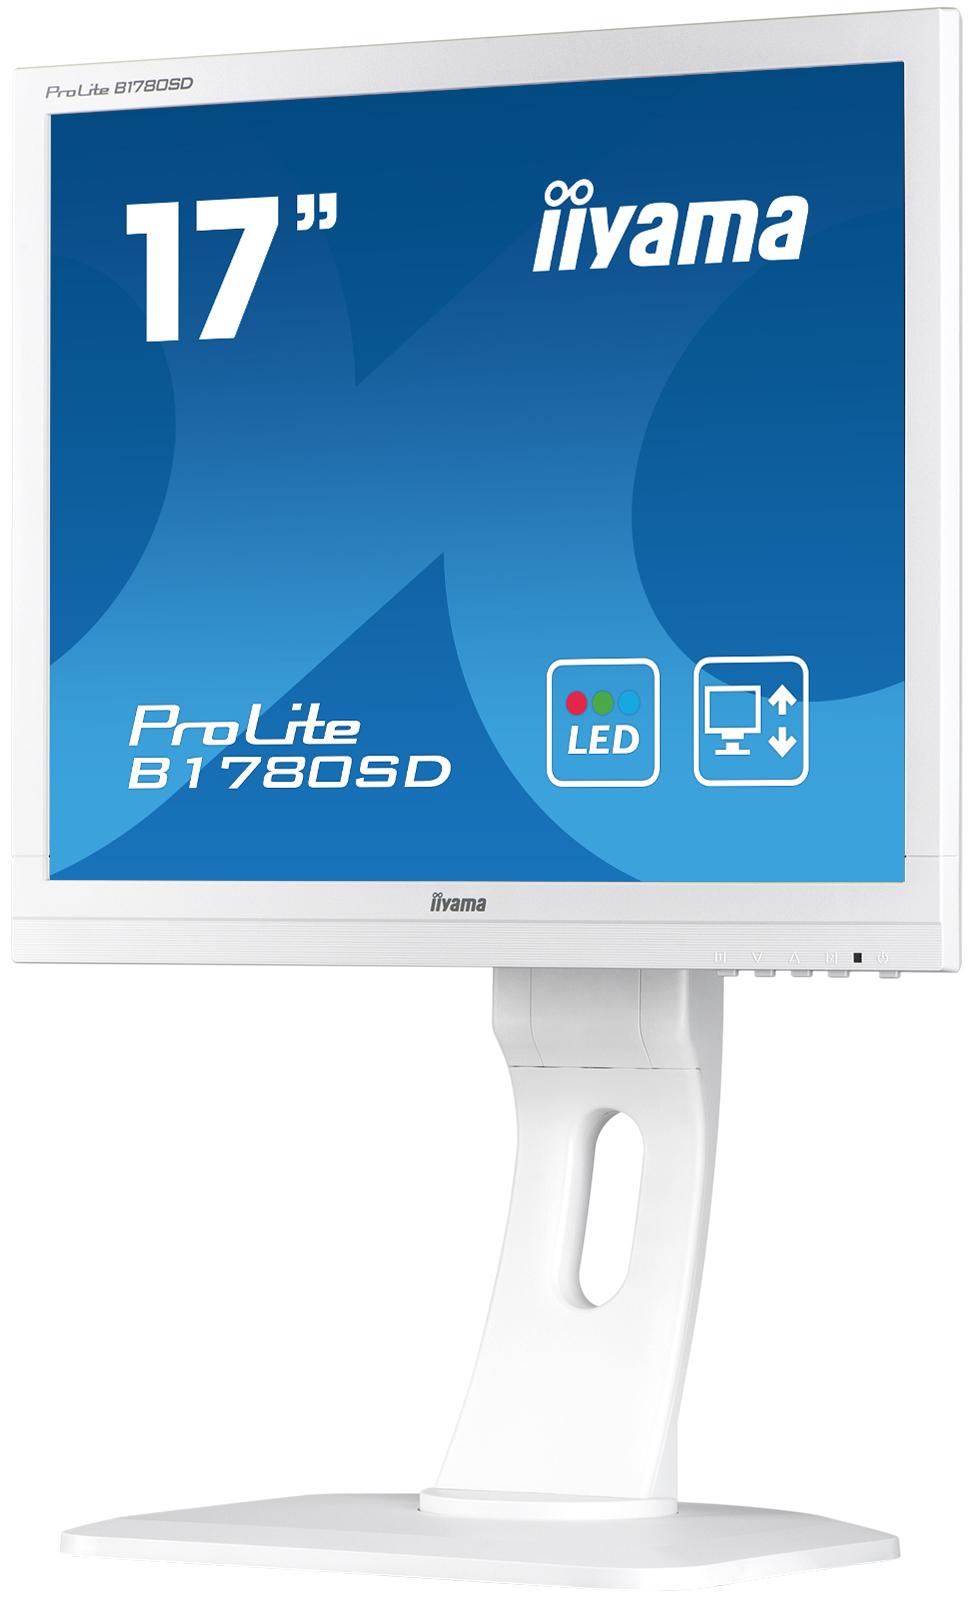 Iiyama LCD Prolite B1780SD 17'' LED, 5ms, VGA/DVI, repro, 1280x1024, HAS,pivot,b